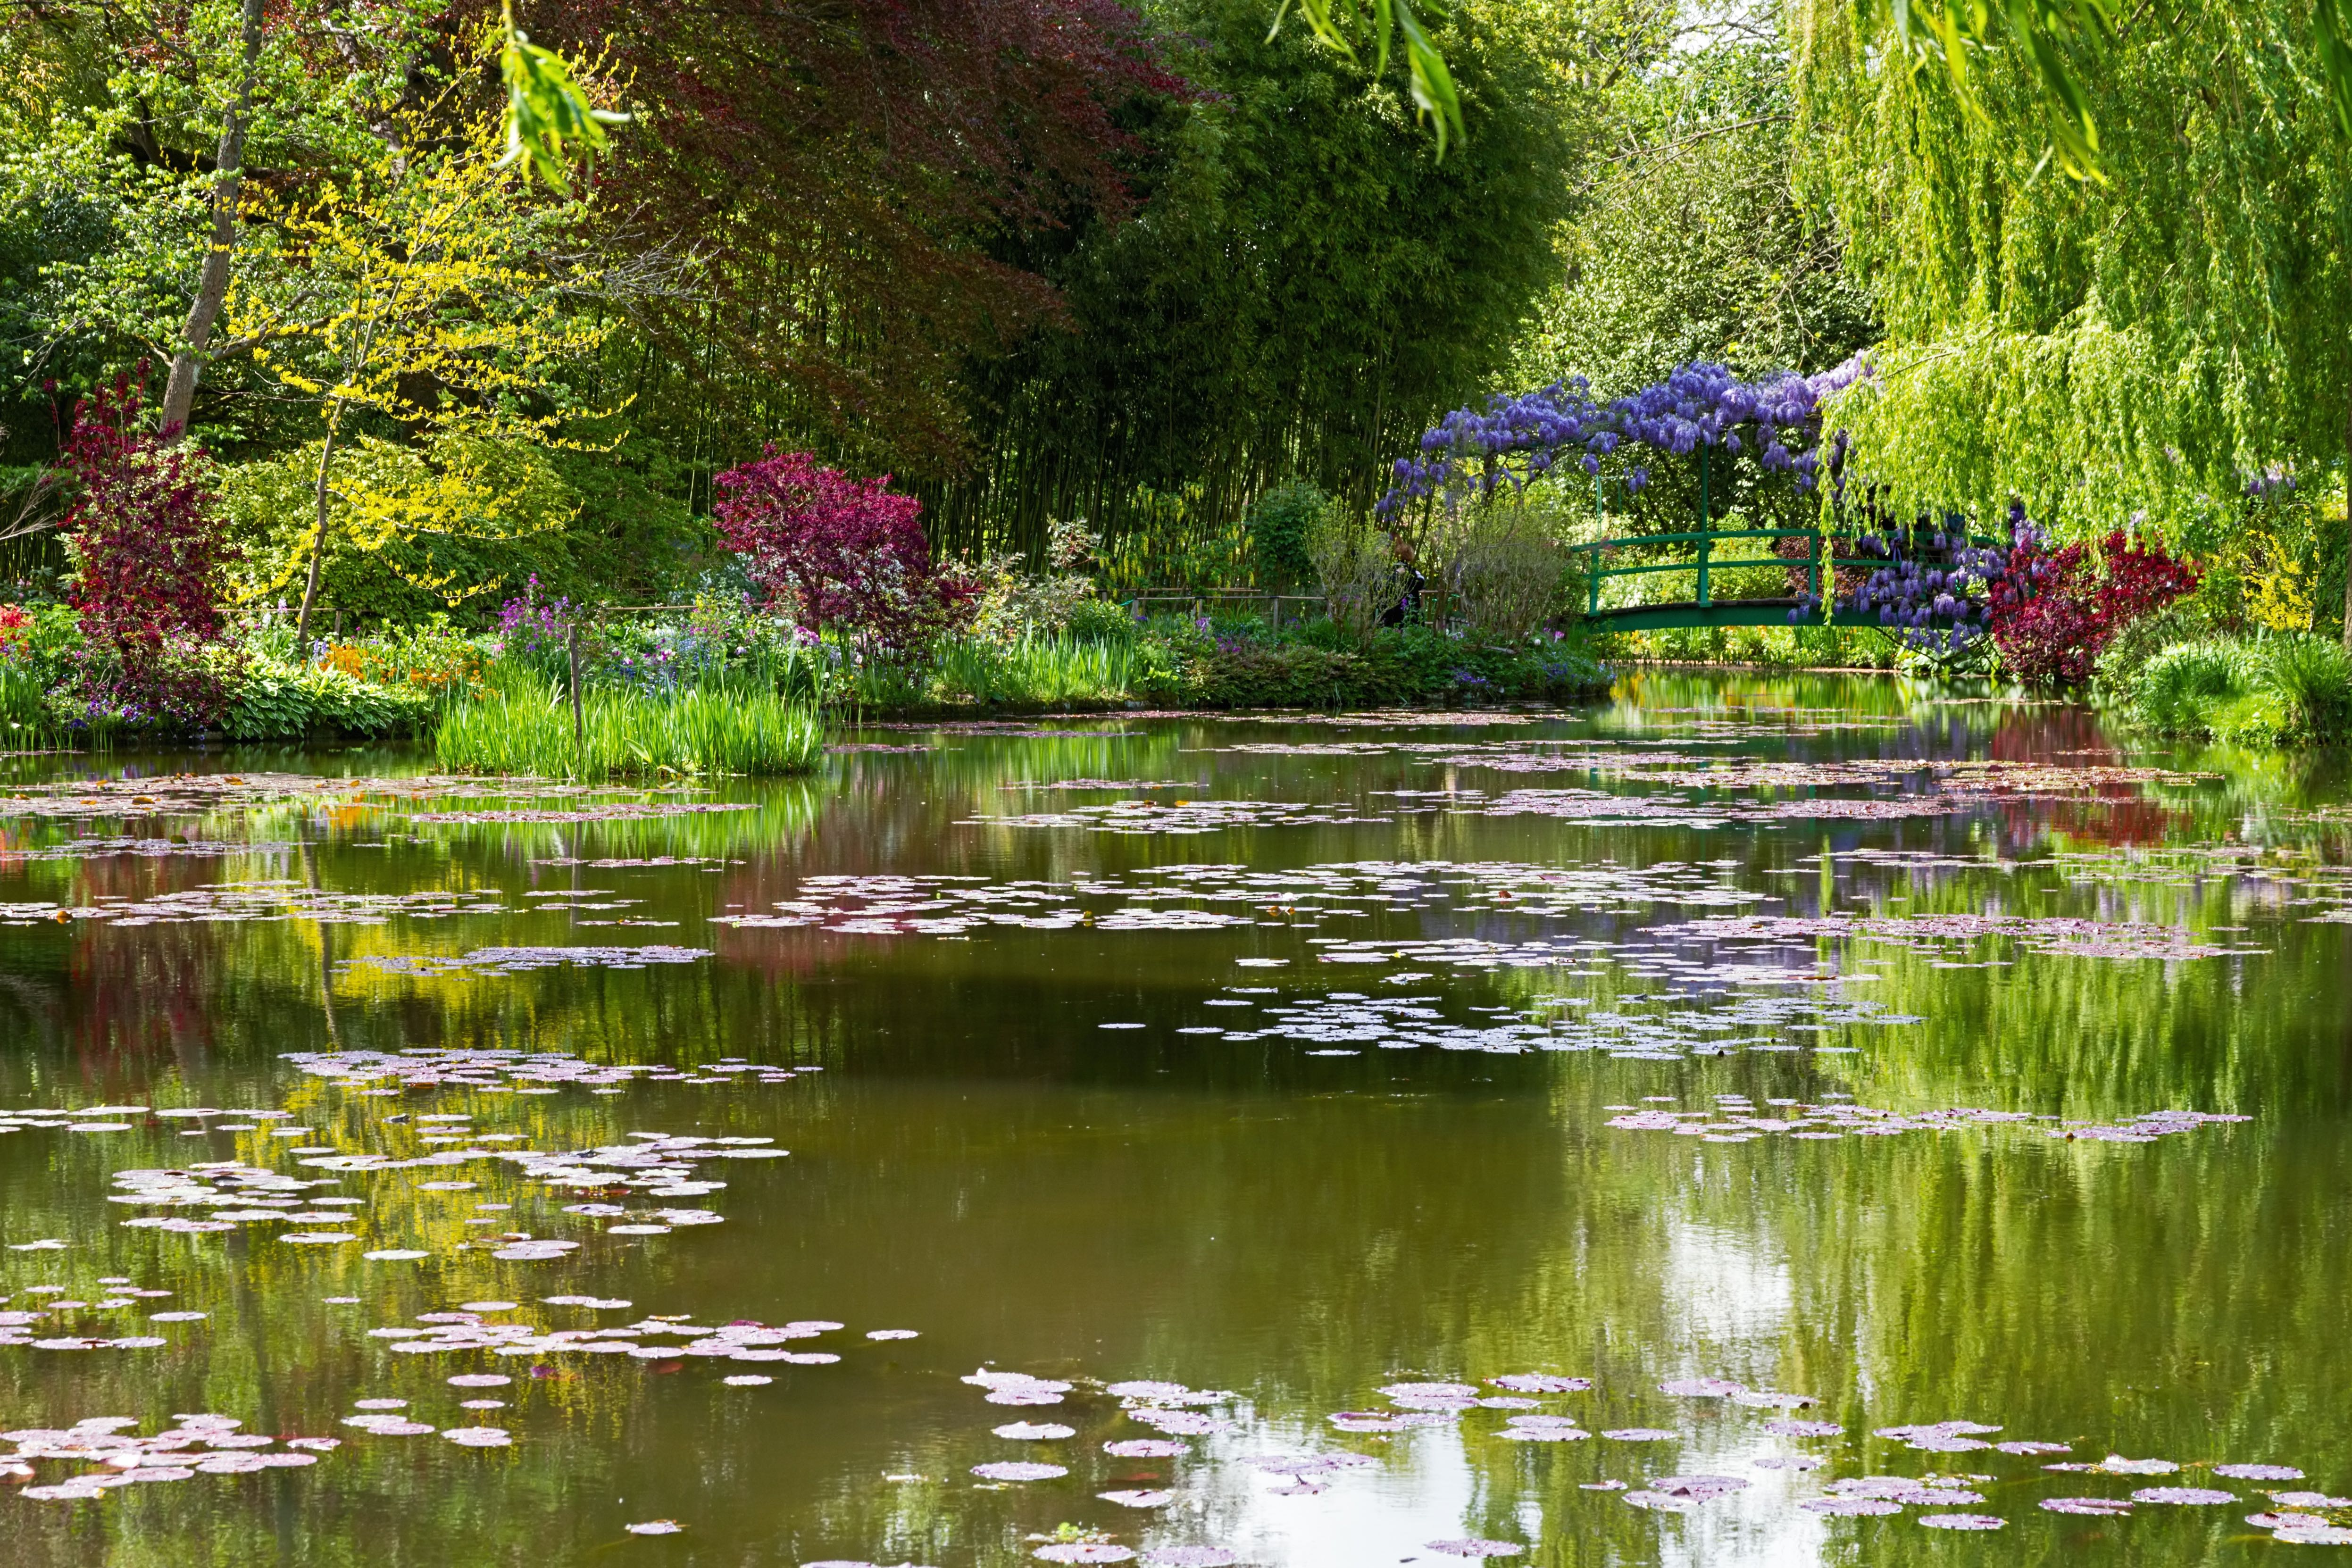 Giverny, le paradis de Claude Monet - Hortus Focus I mag